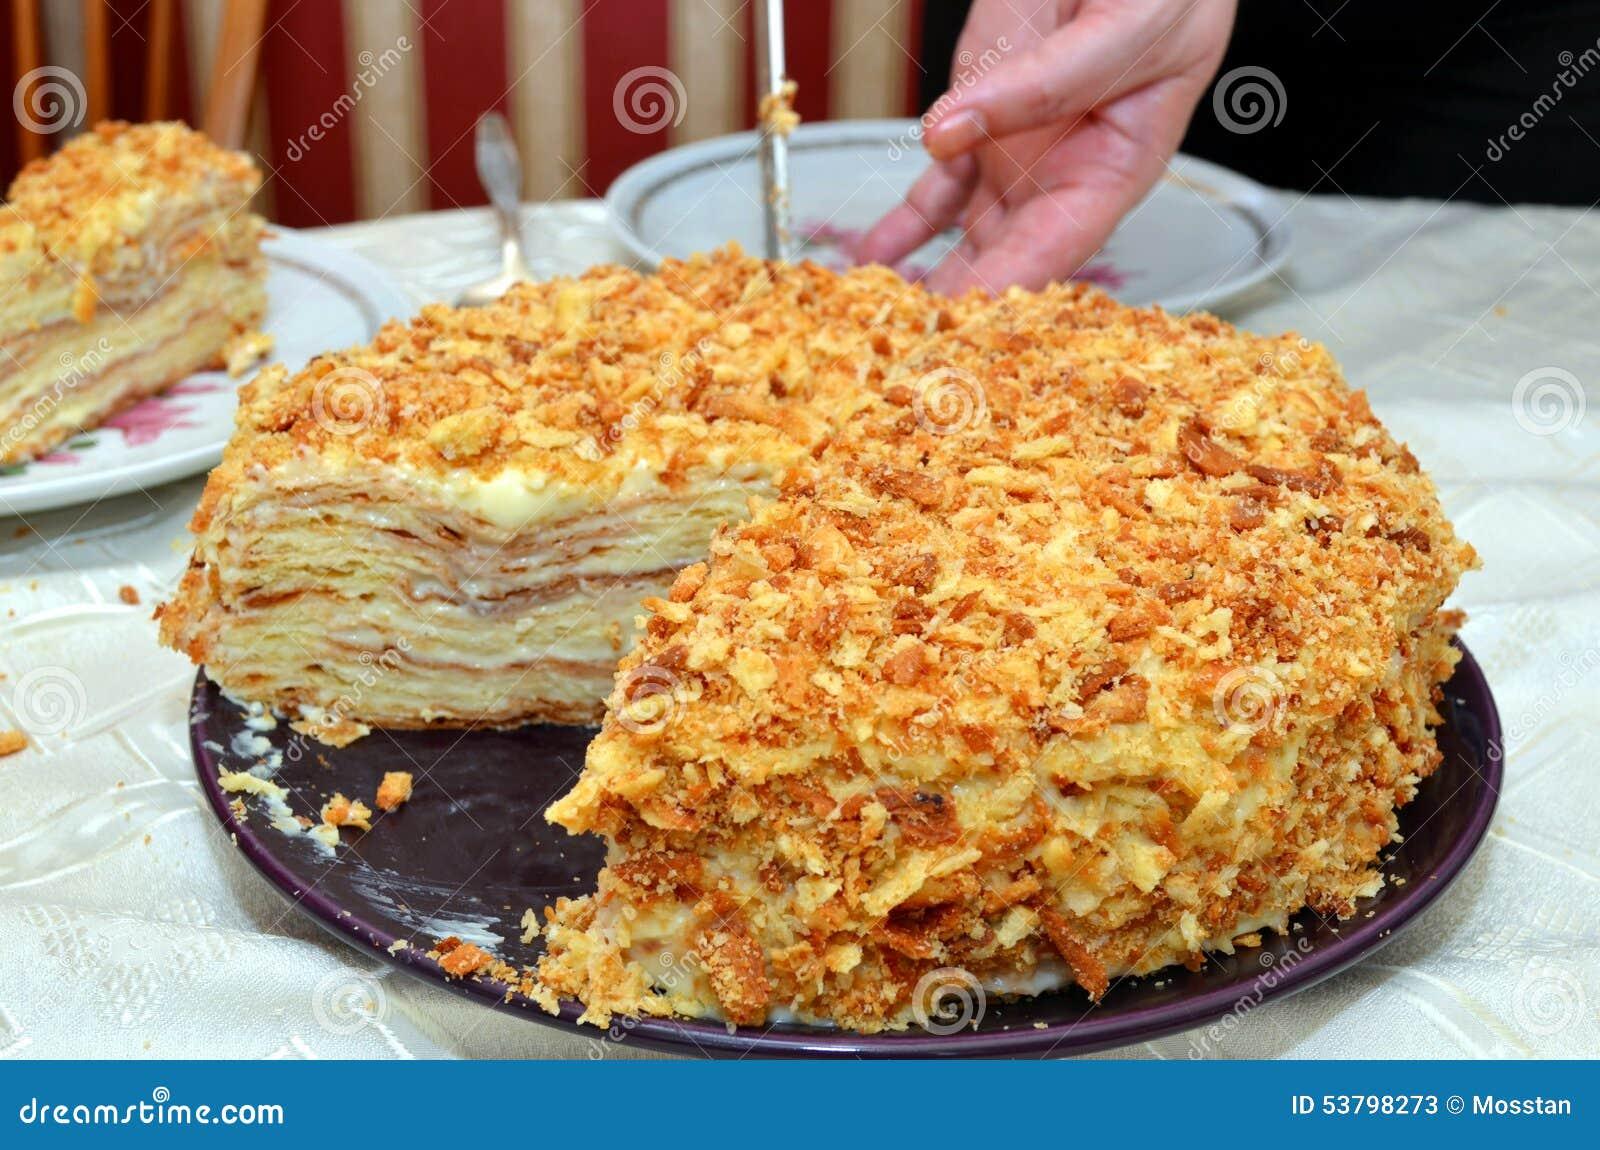 Cutting The Birthday Cake Stock Image Image Of Knife 53798273